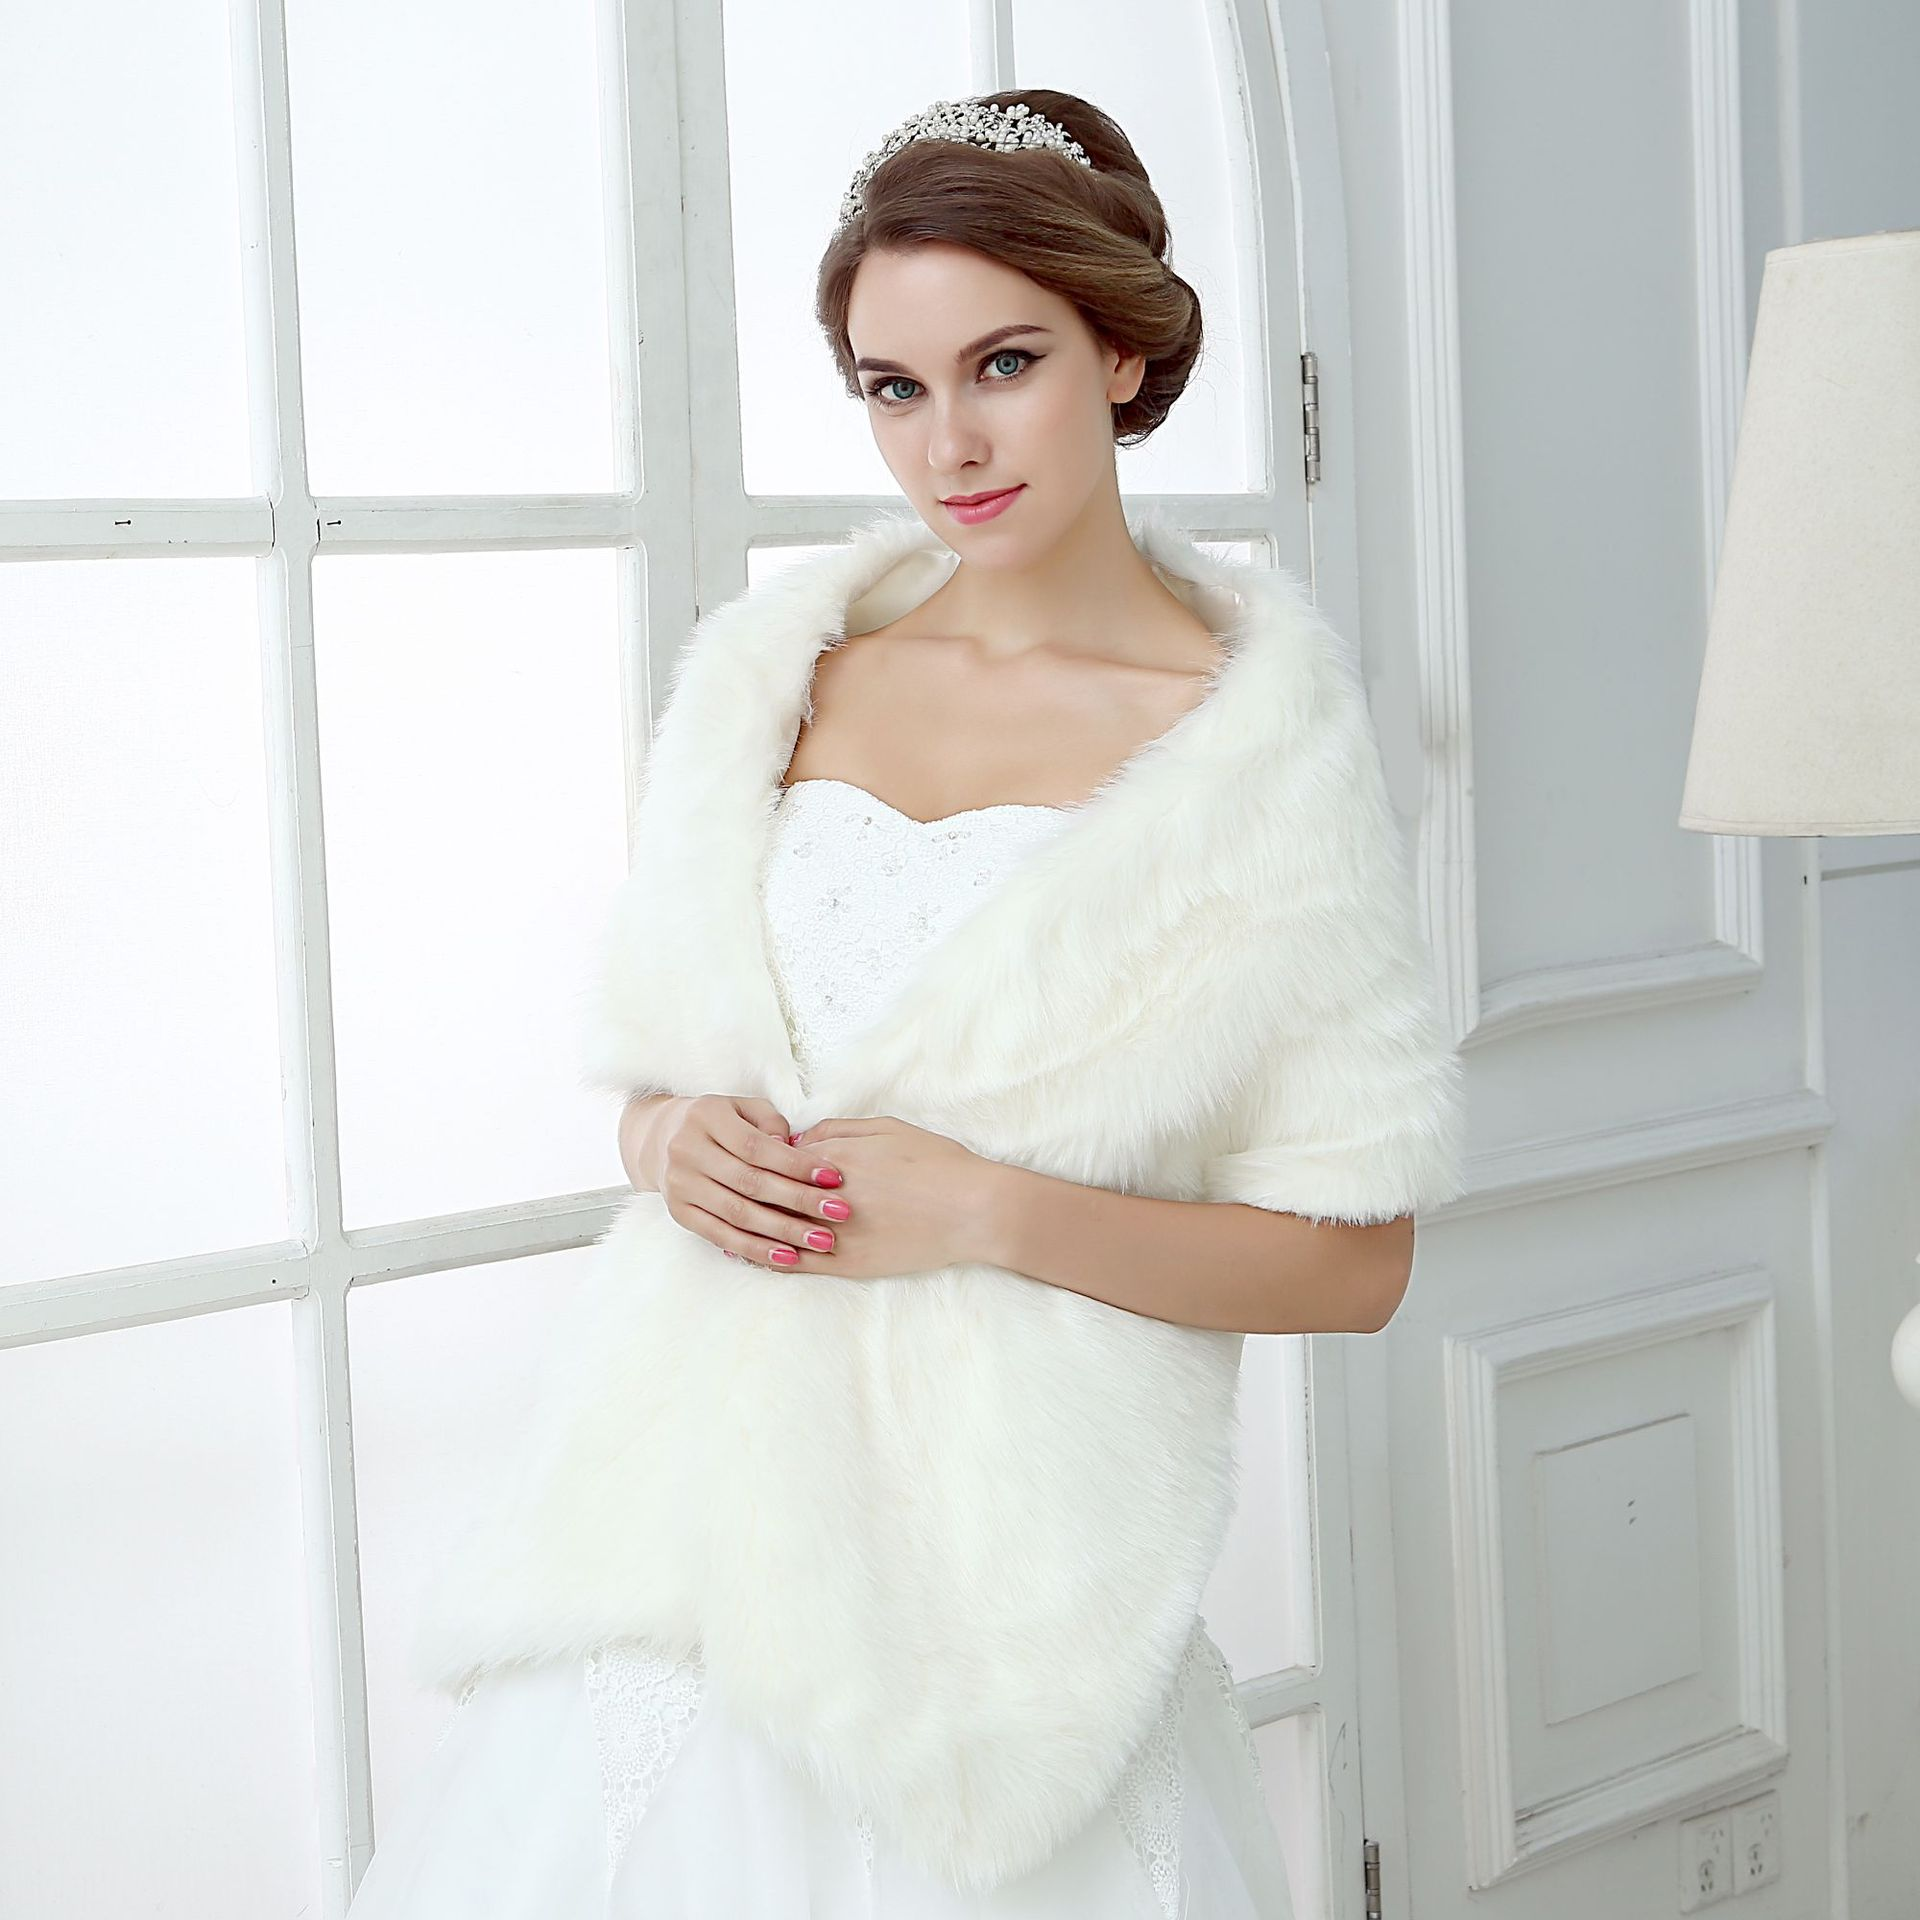 Hot Sale Warm Ivory Bolero Women Jackets Soft Faux Fur 160 CM One Size Wedding Accessories Bridal Wraps Shawls